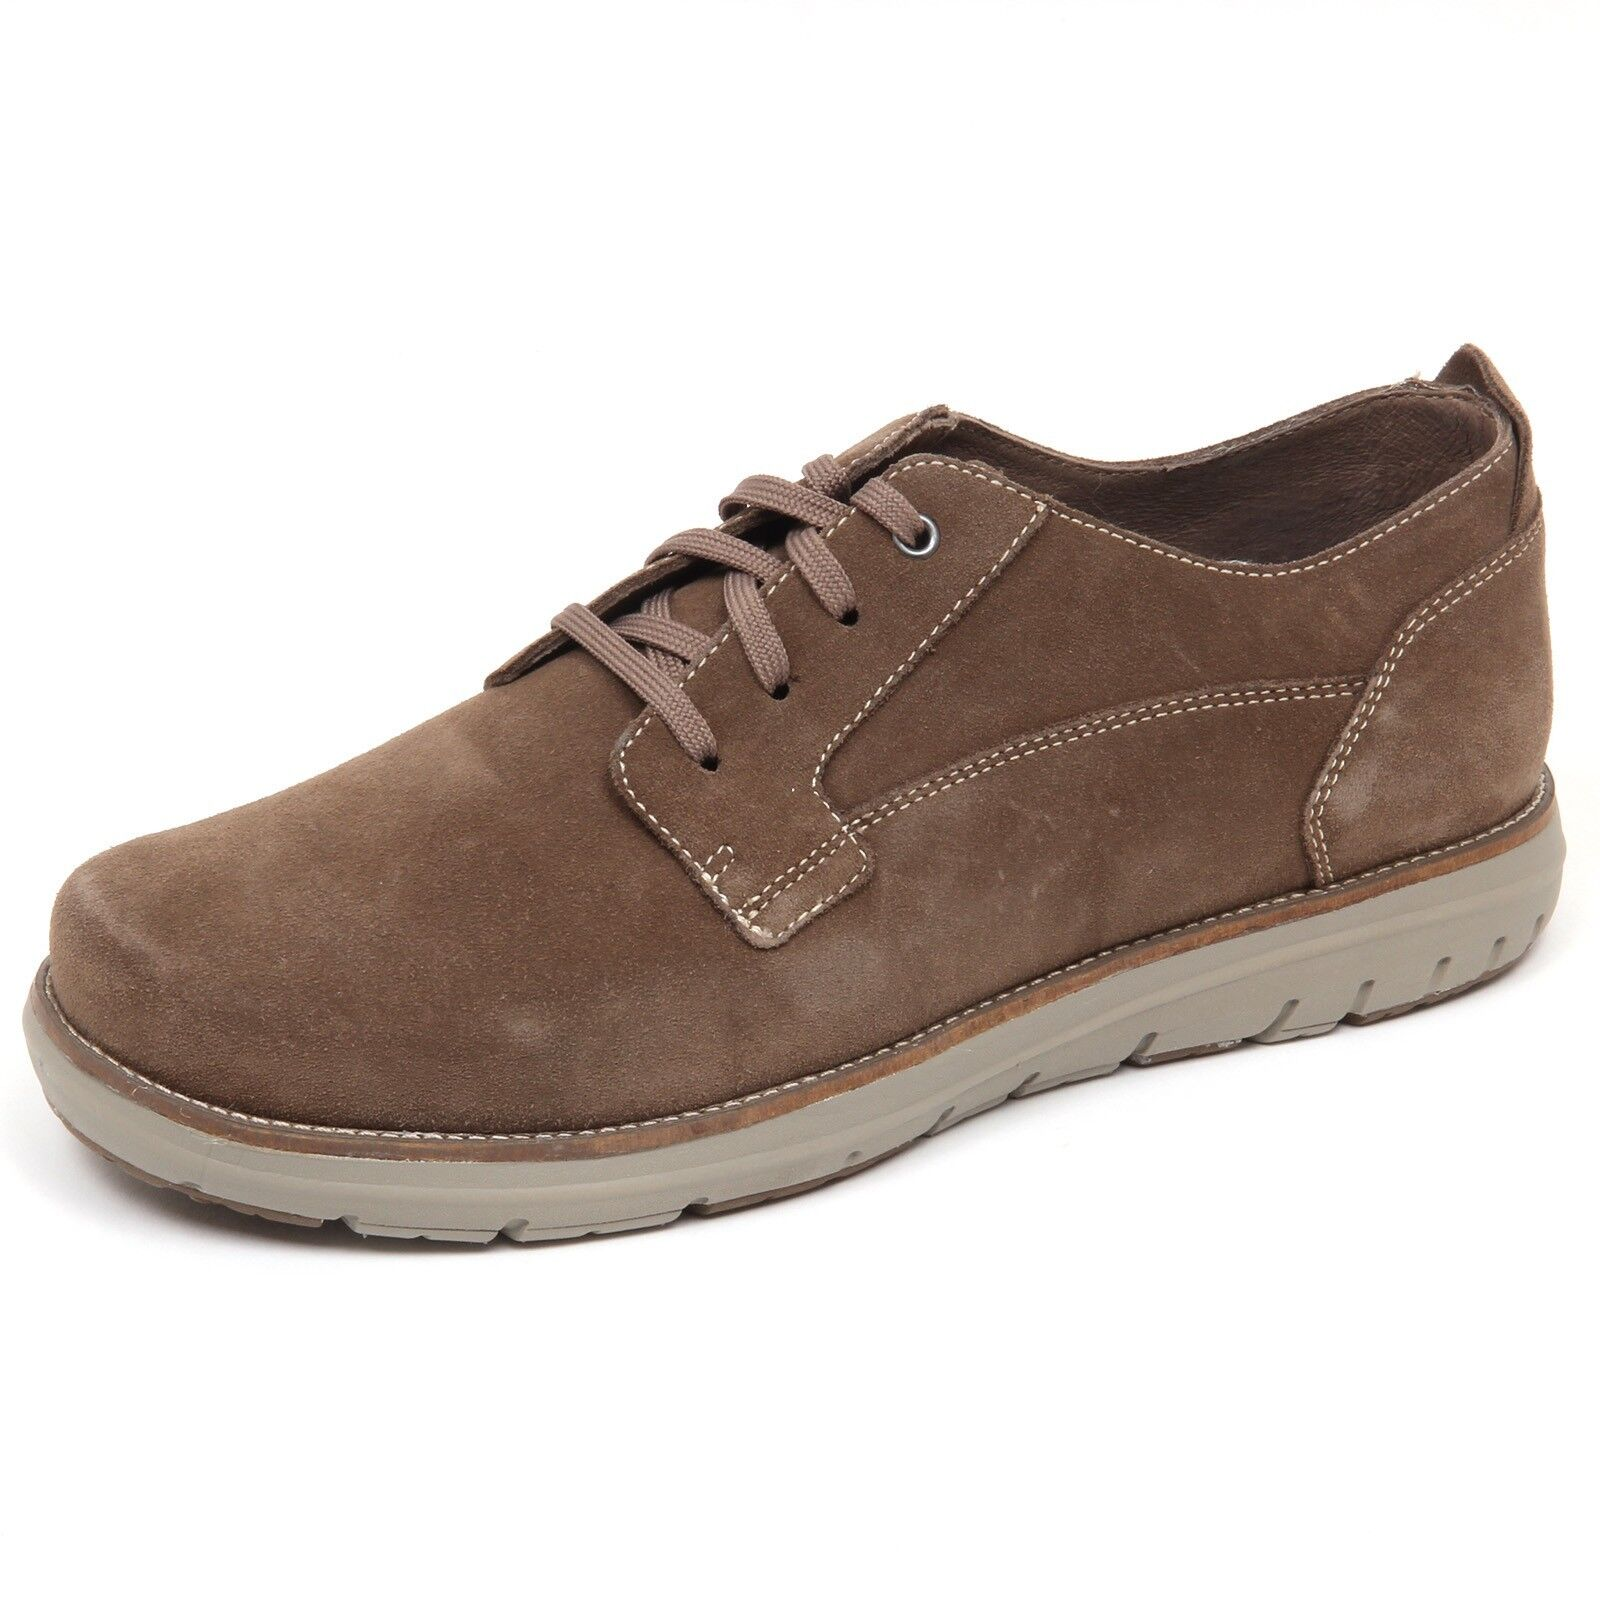 D5036 (SAMPLE NOT FOR SALES WITHOUT BOX) scarpa man uomo grey L.L.BEAN shoe man scarpa 02d29f